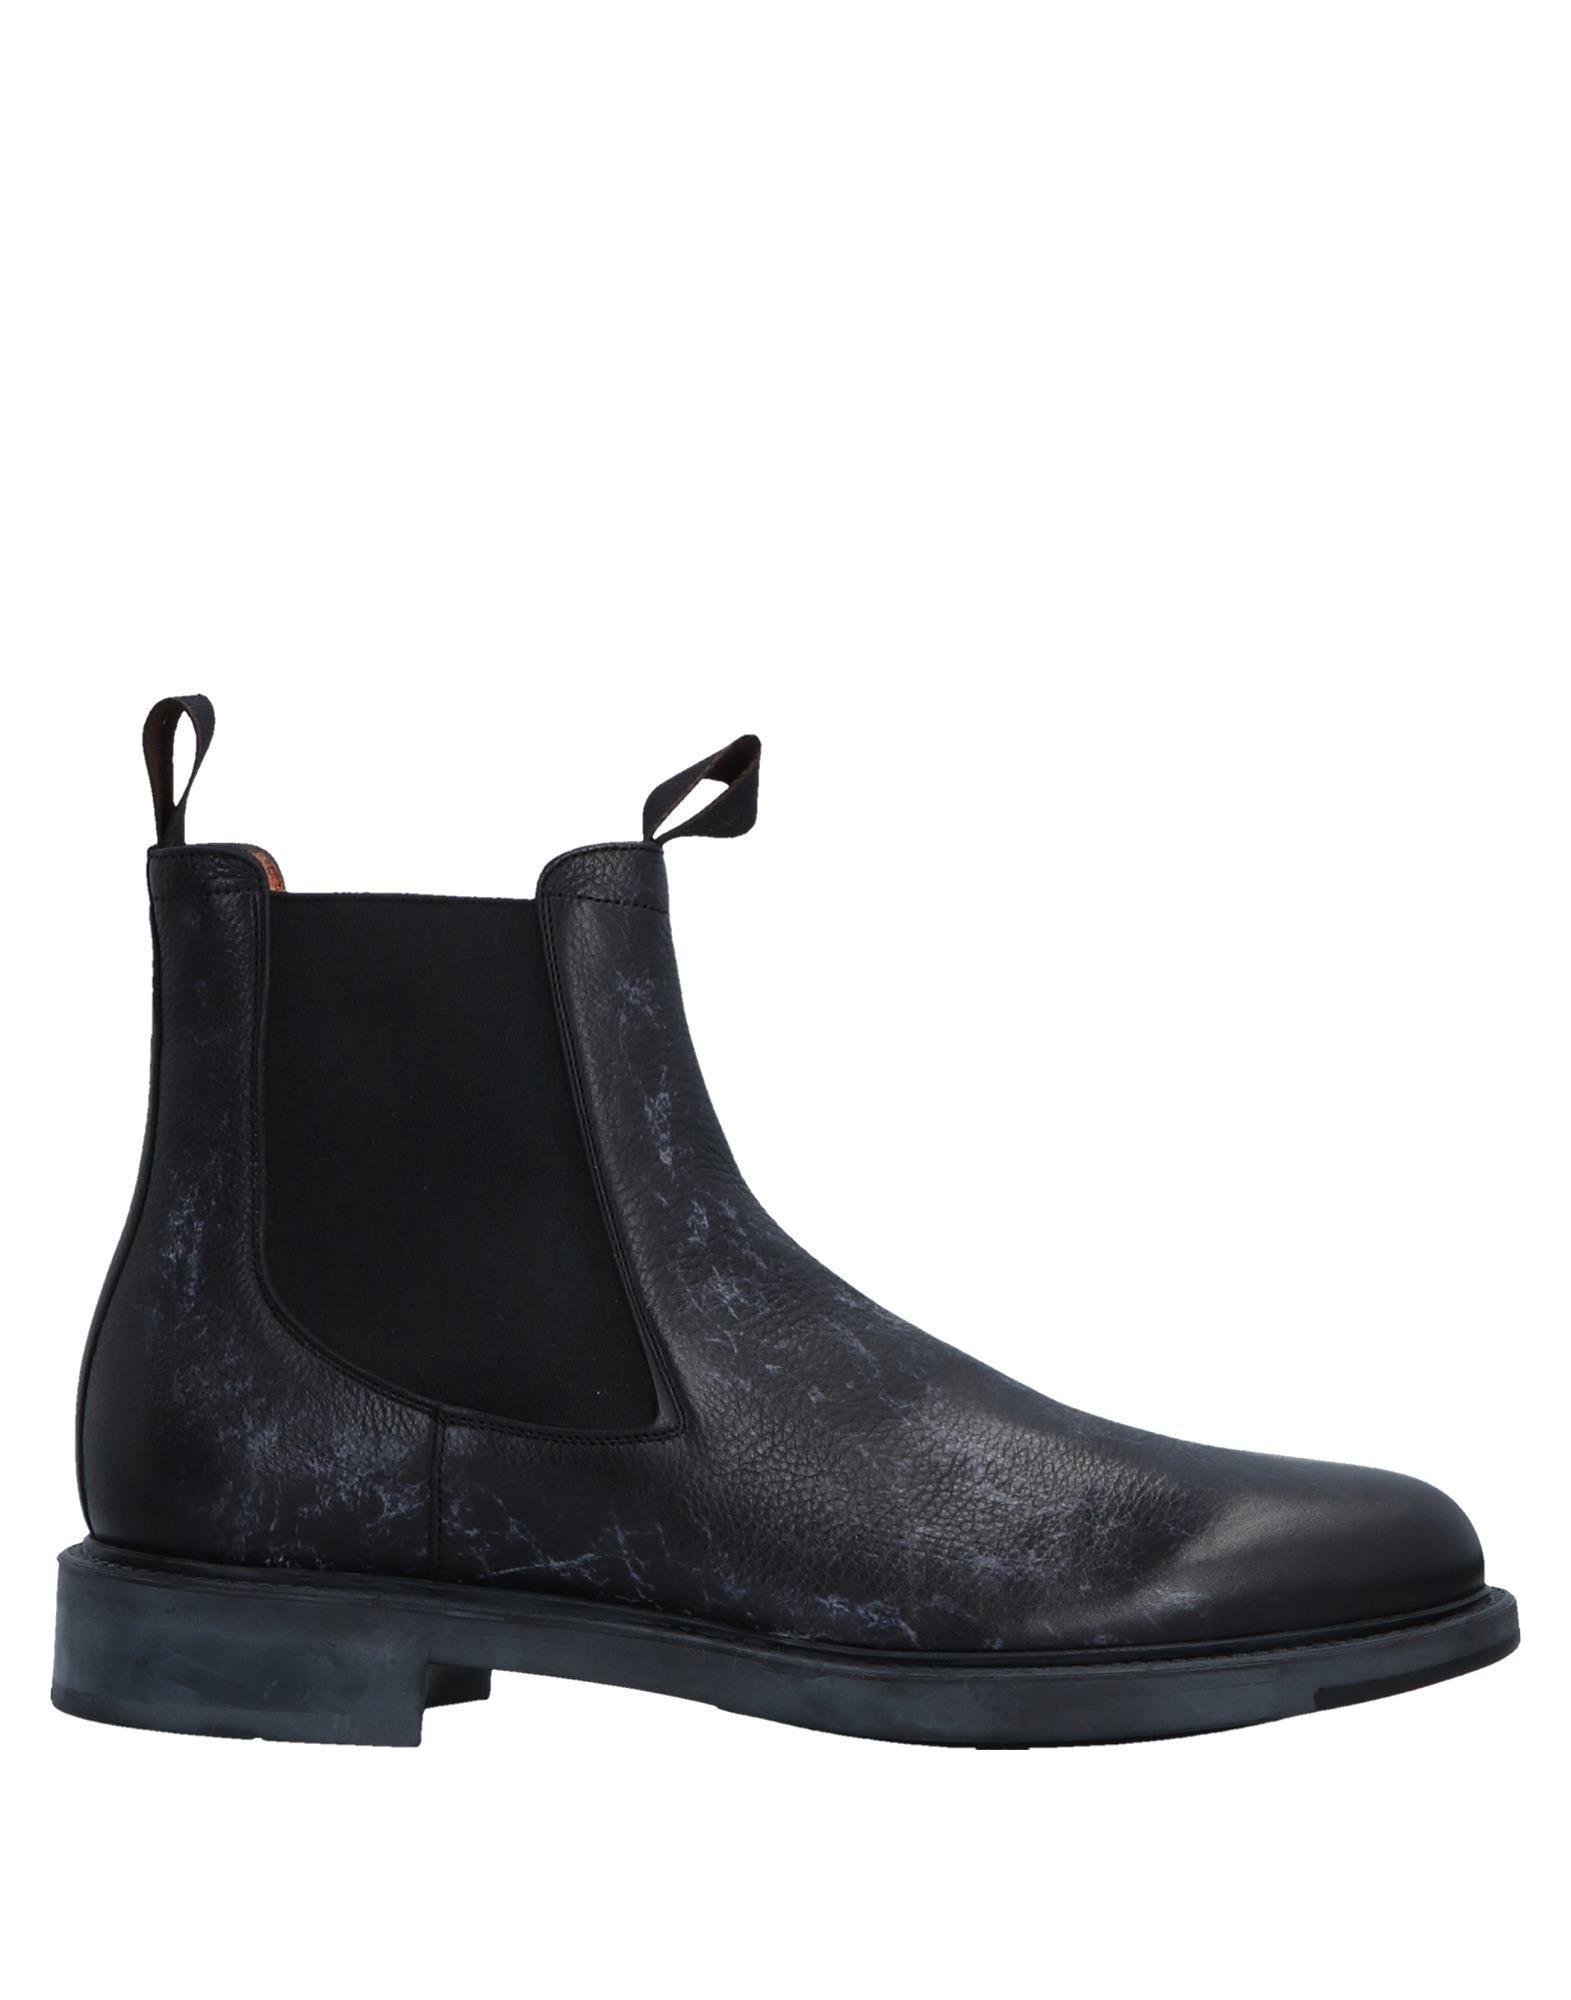 7bc9e7f9150 Santoni Ankle Boots in Black for Men - Lyst